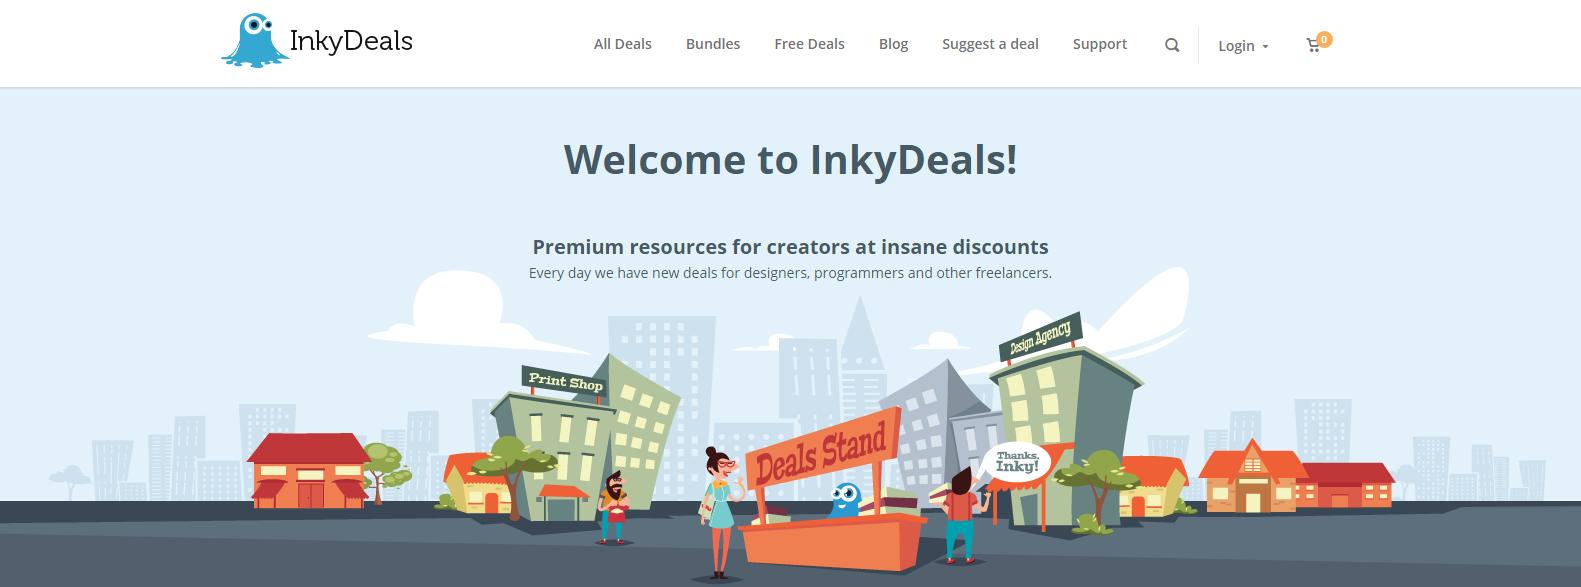 InkyDeals 50% Easter Discount